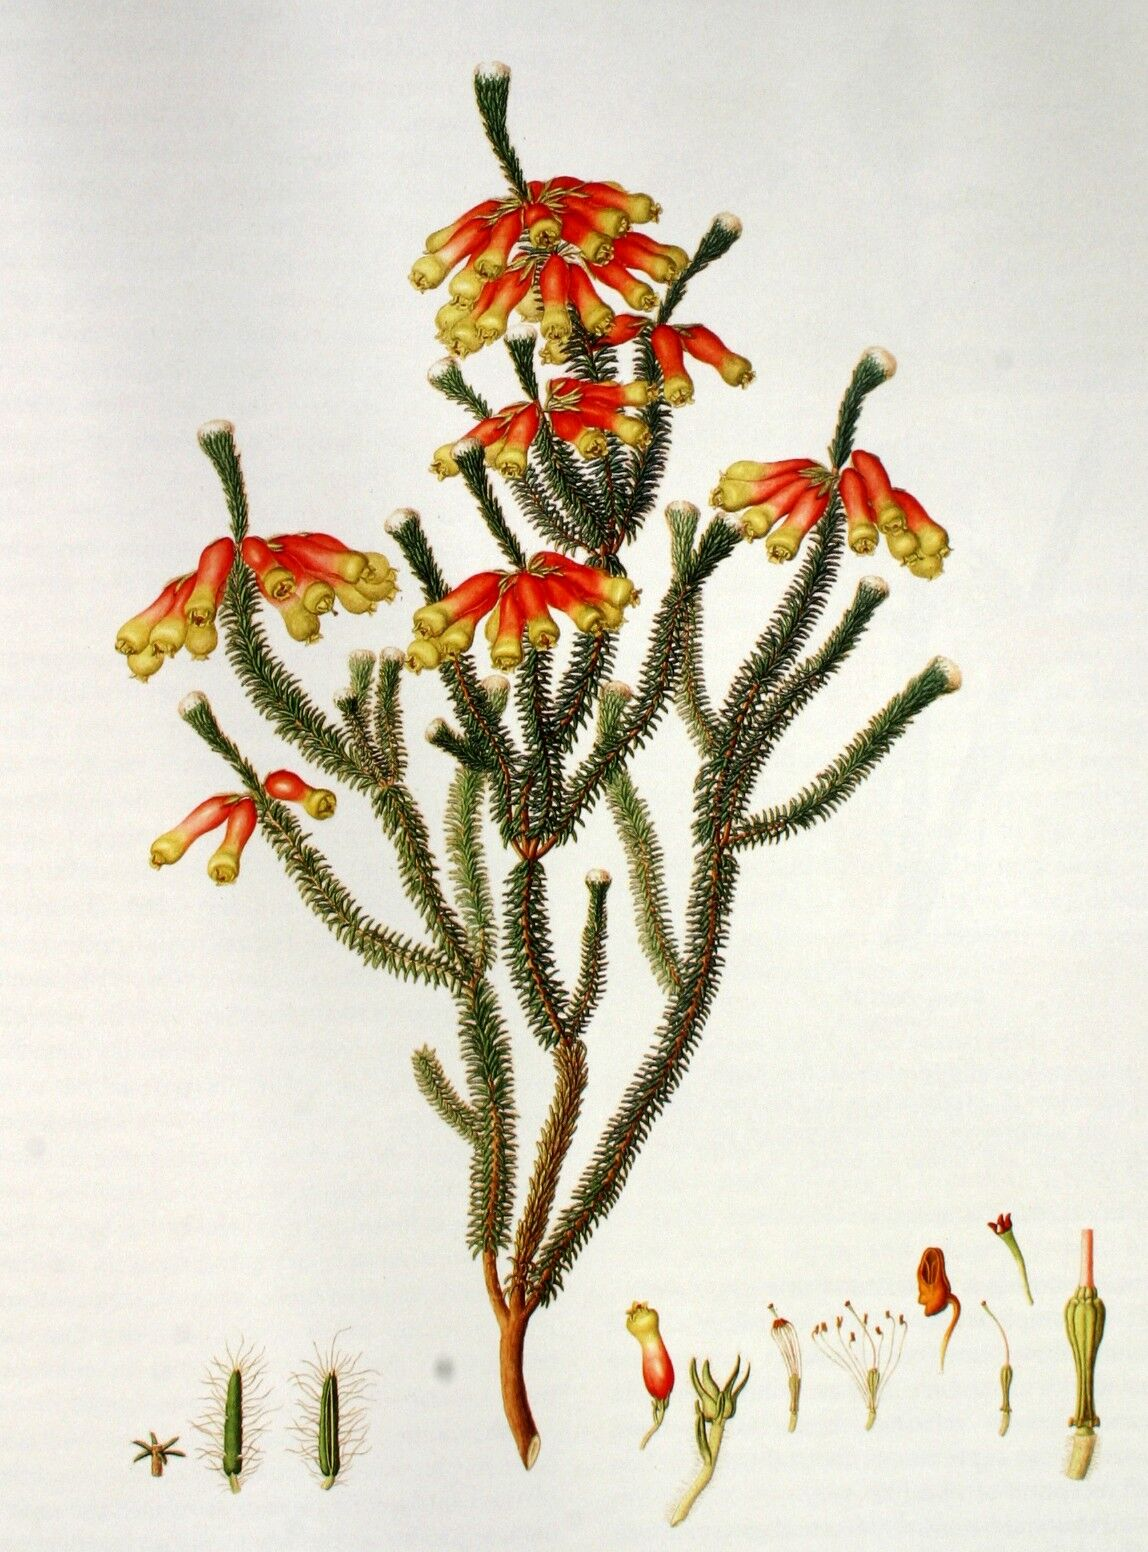 Erica massoni L.f., 1796-1803.